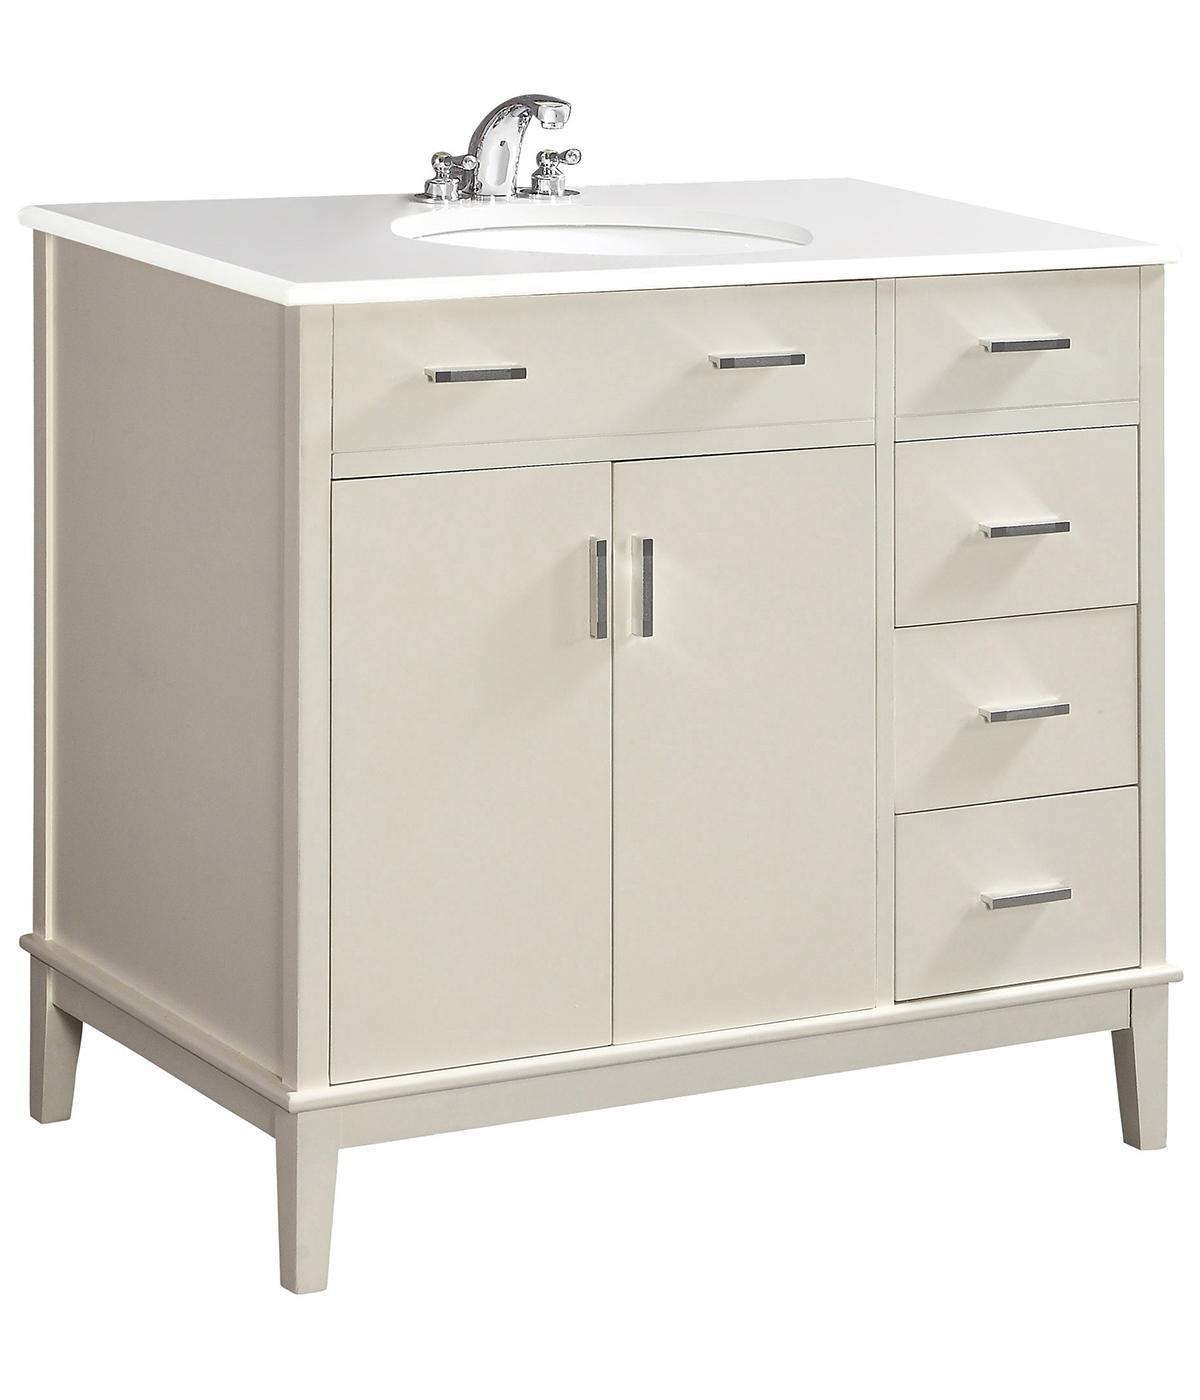 "Contemporary Urban Bath Vanity Light: Simpli Home Urban Loft 36"" Bath Vanity With Quartz Marble Top, Soft White"